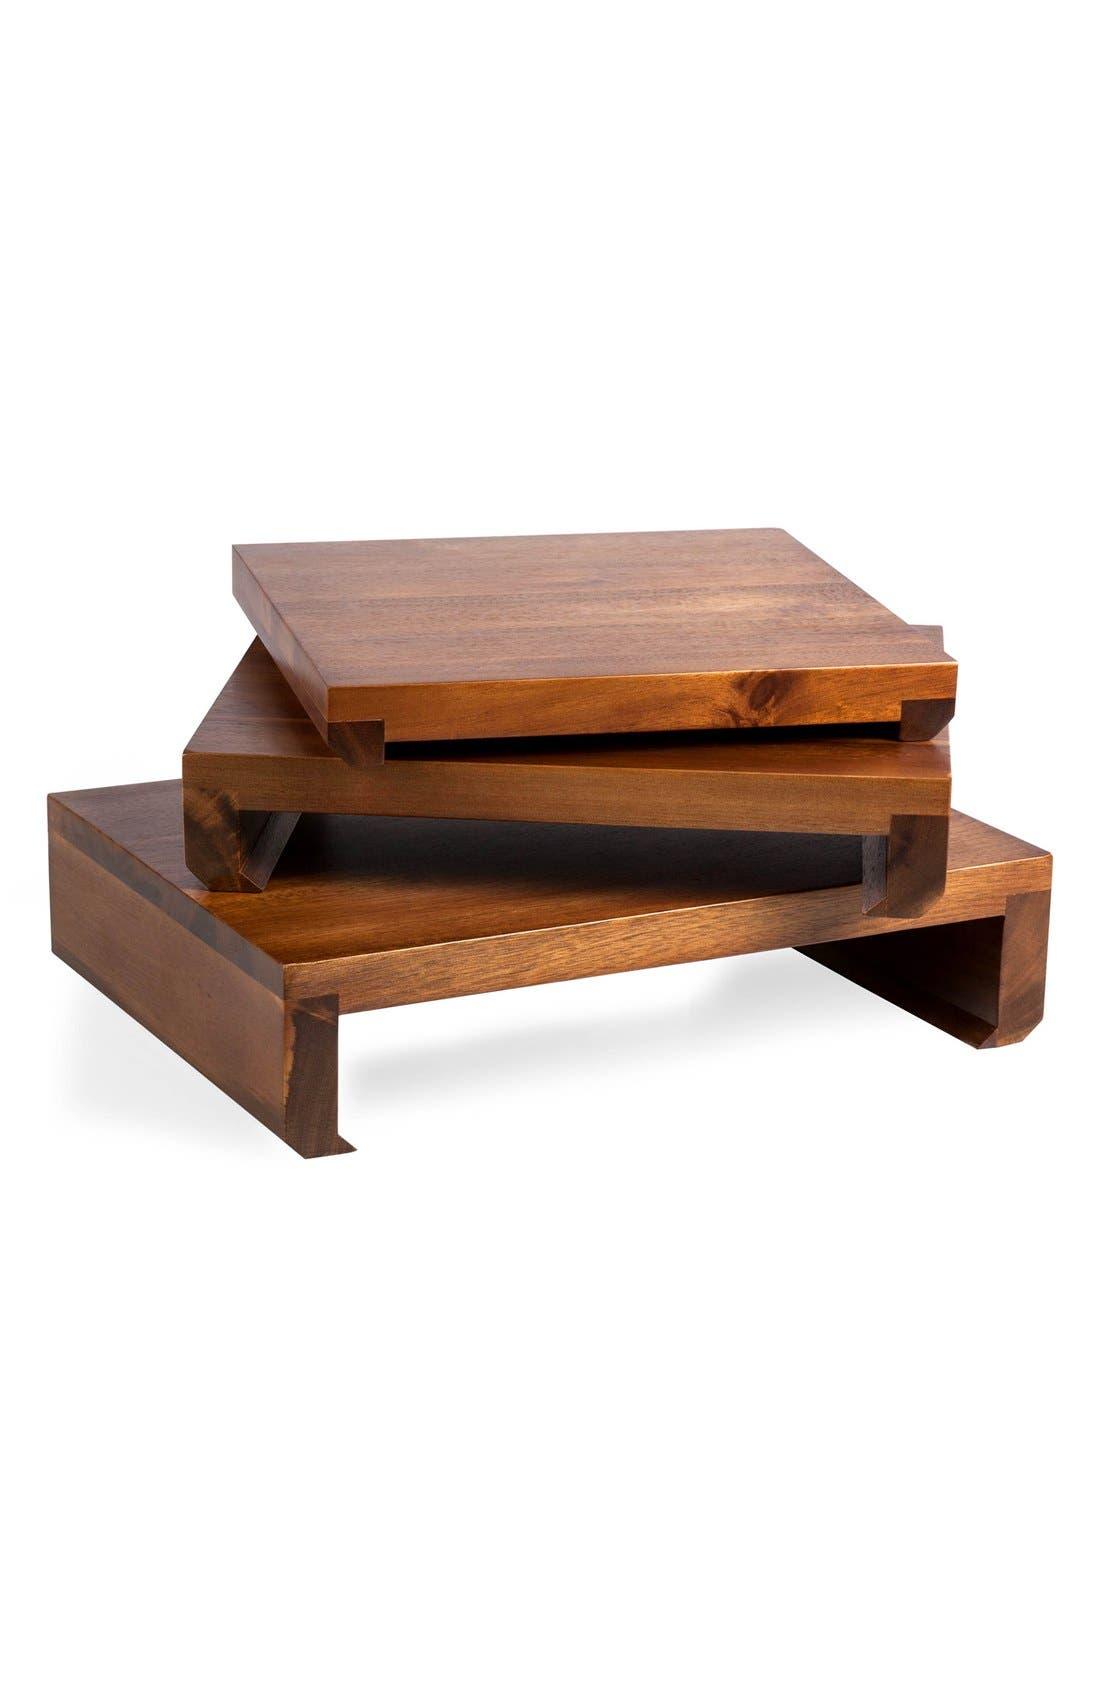 Alternate Image 1 Selected - Picnic Time 'Etage' Wood Serving Pedestals